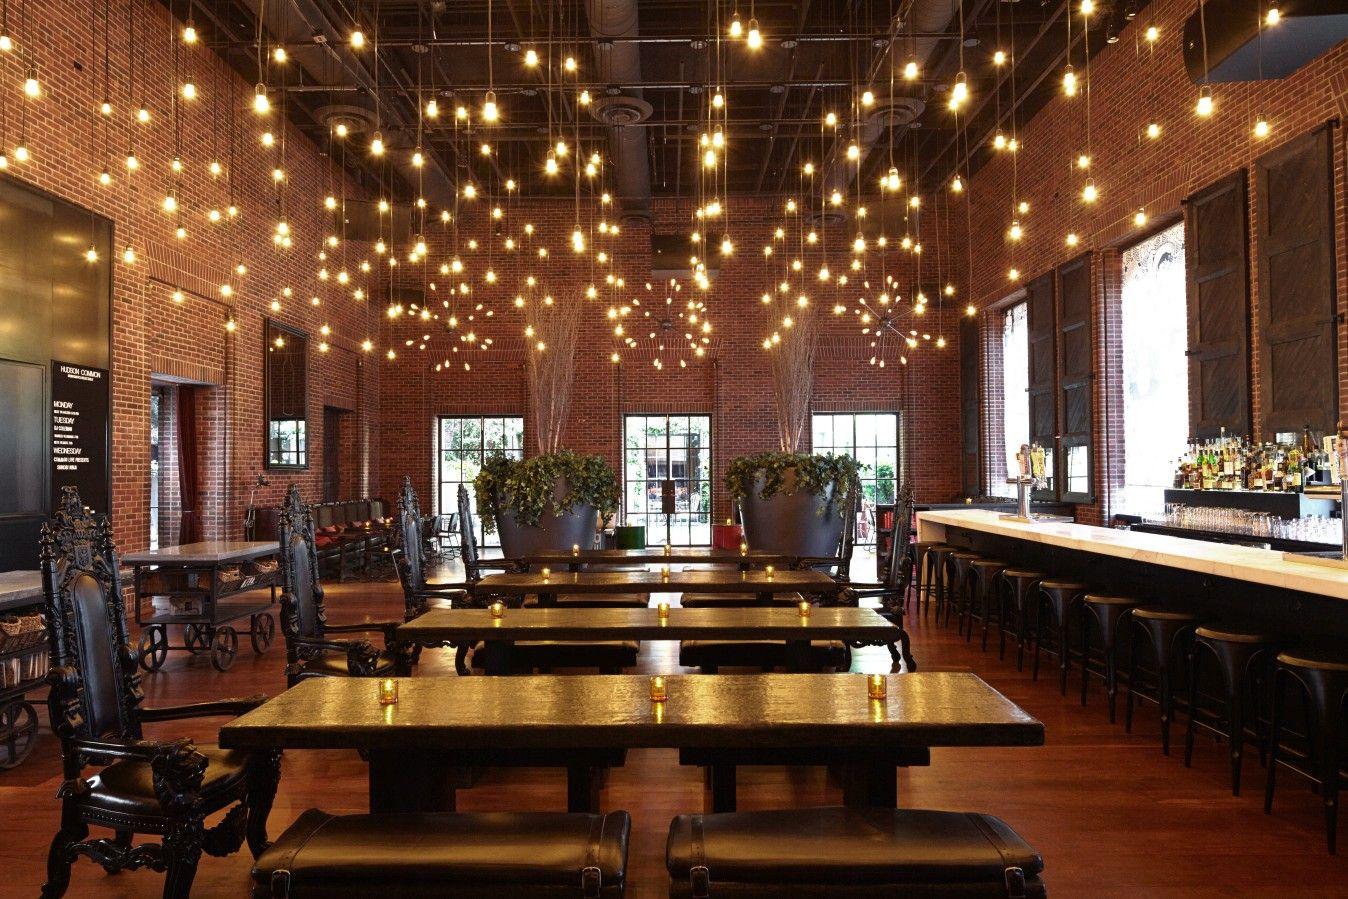 hudson hotel new york - Google Search